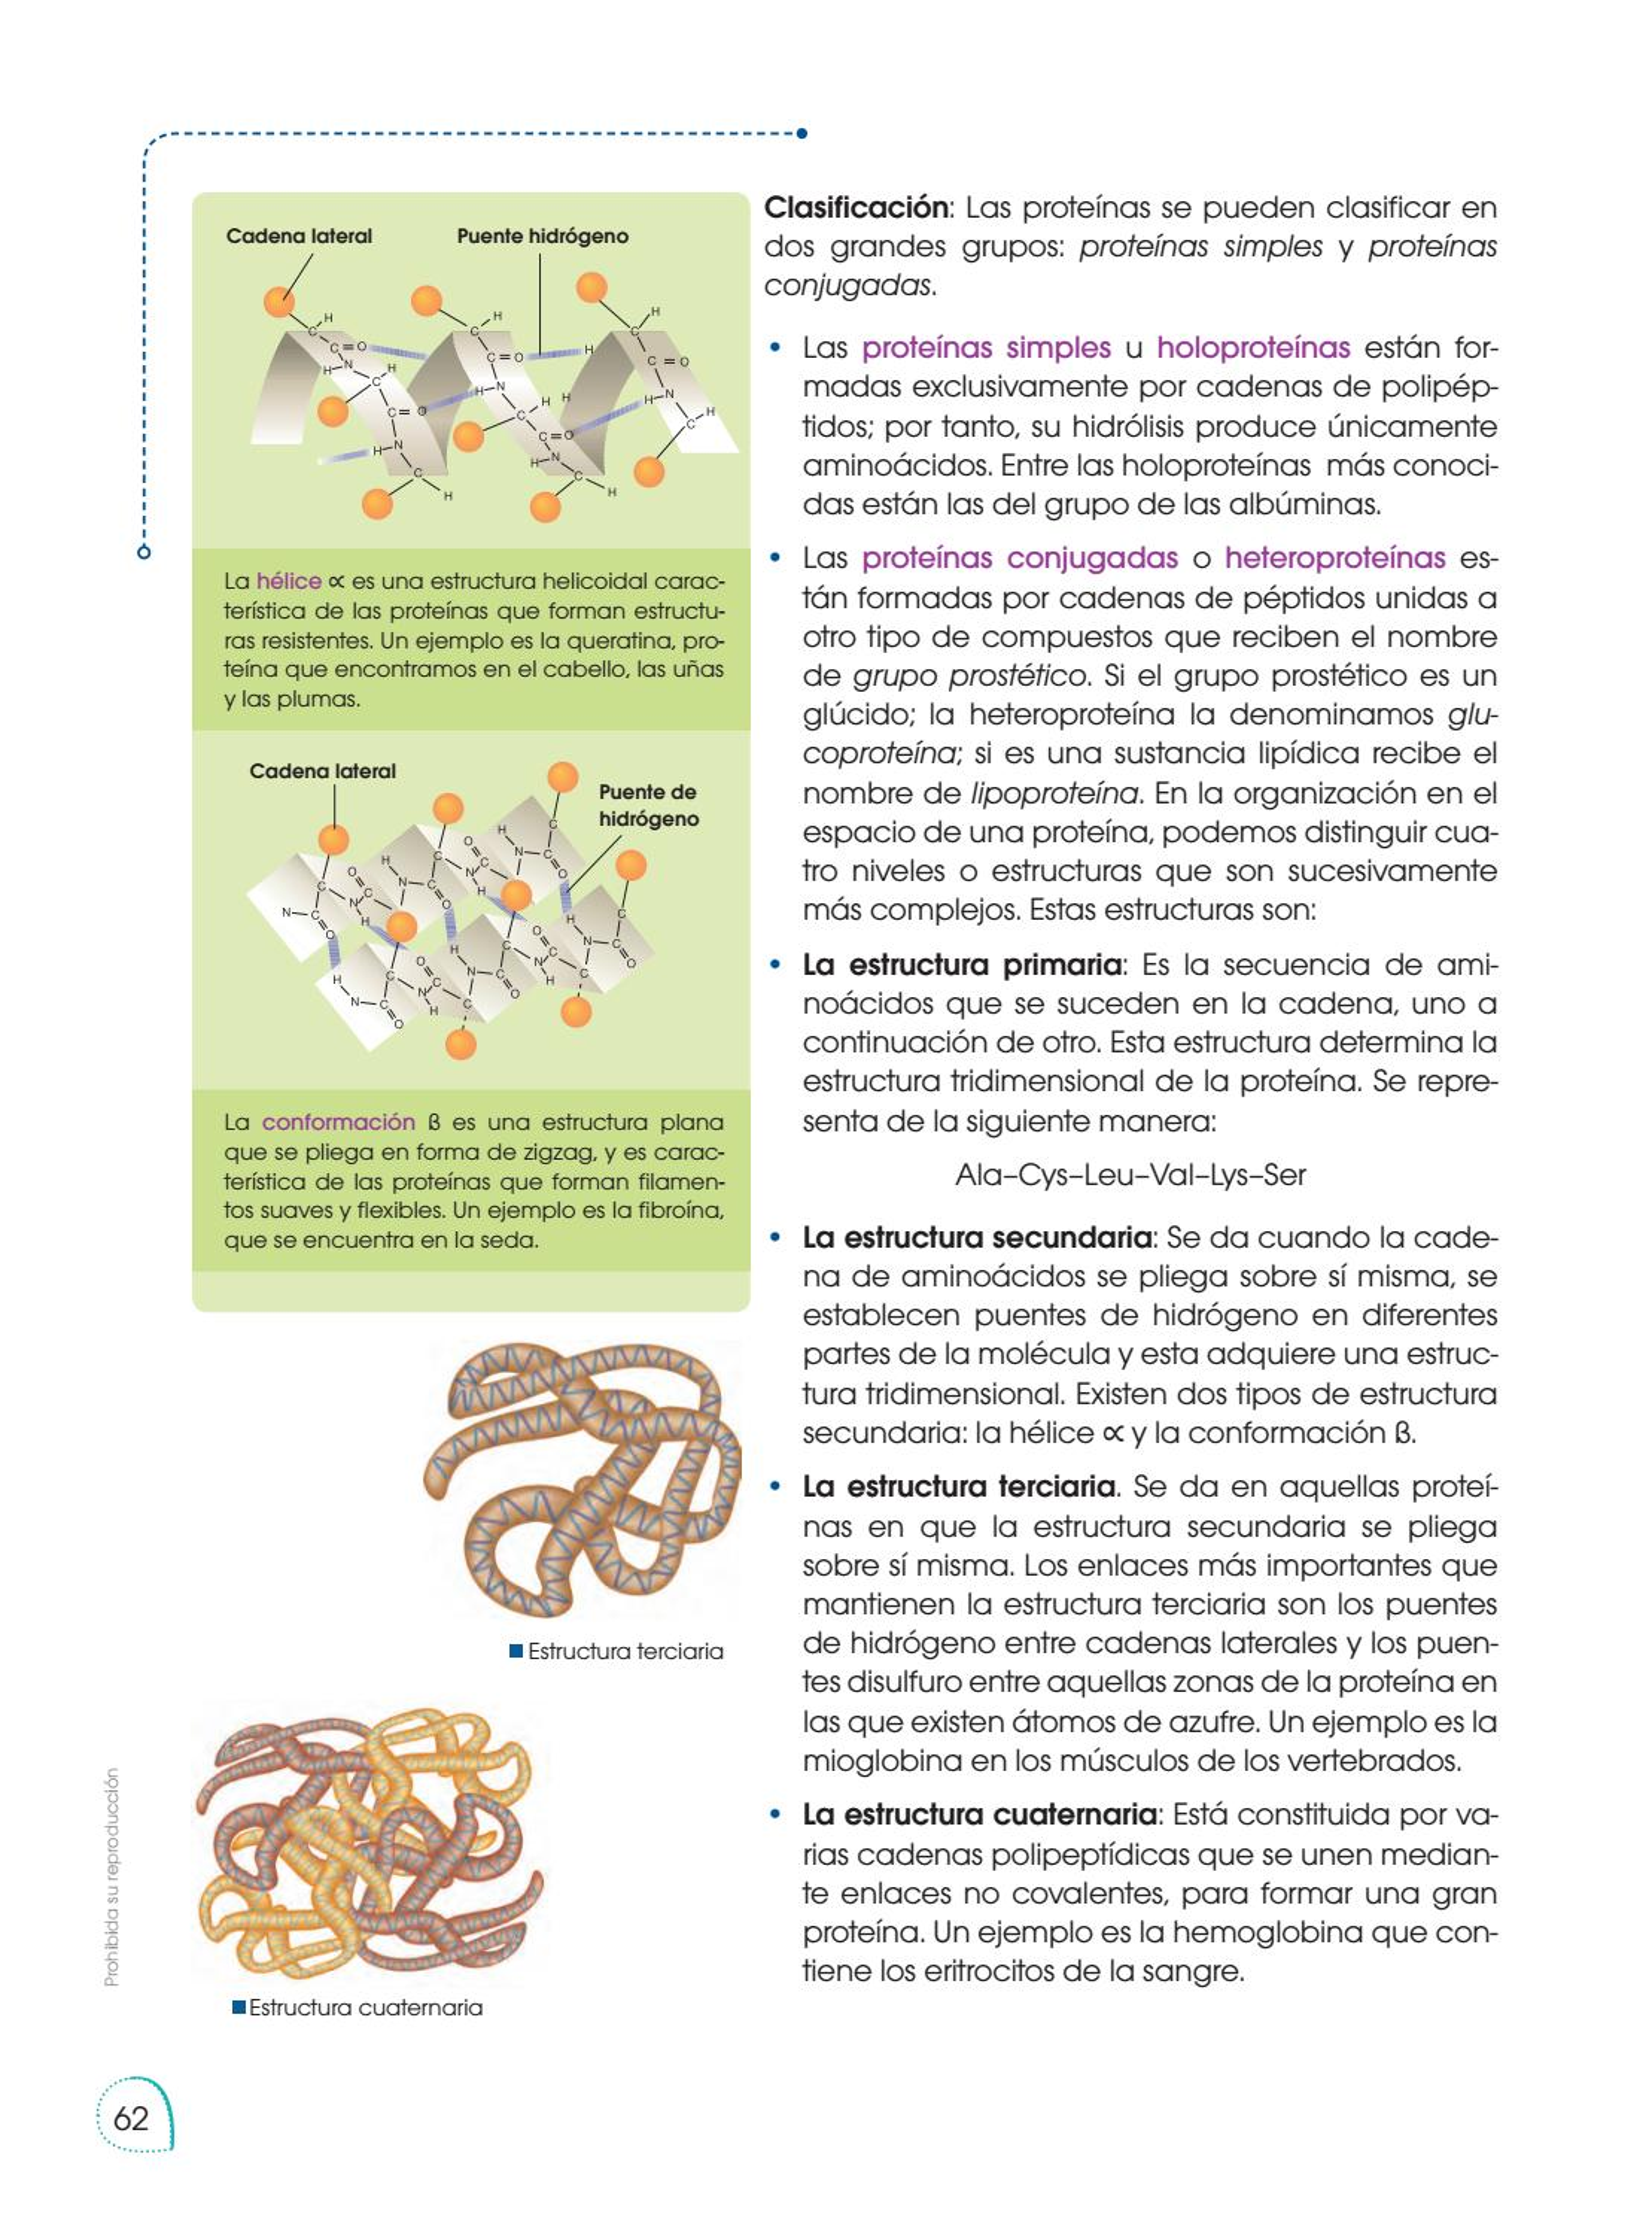 Biologia 1 Bgu By Margarita Sandoval Issuu